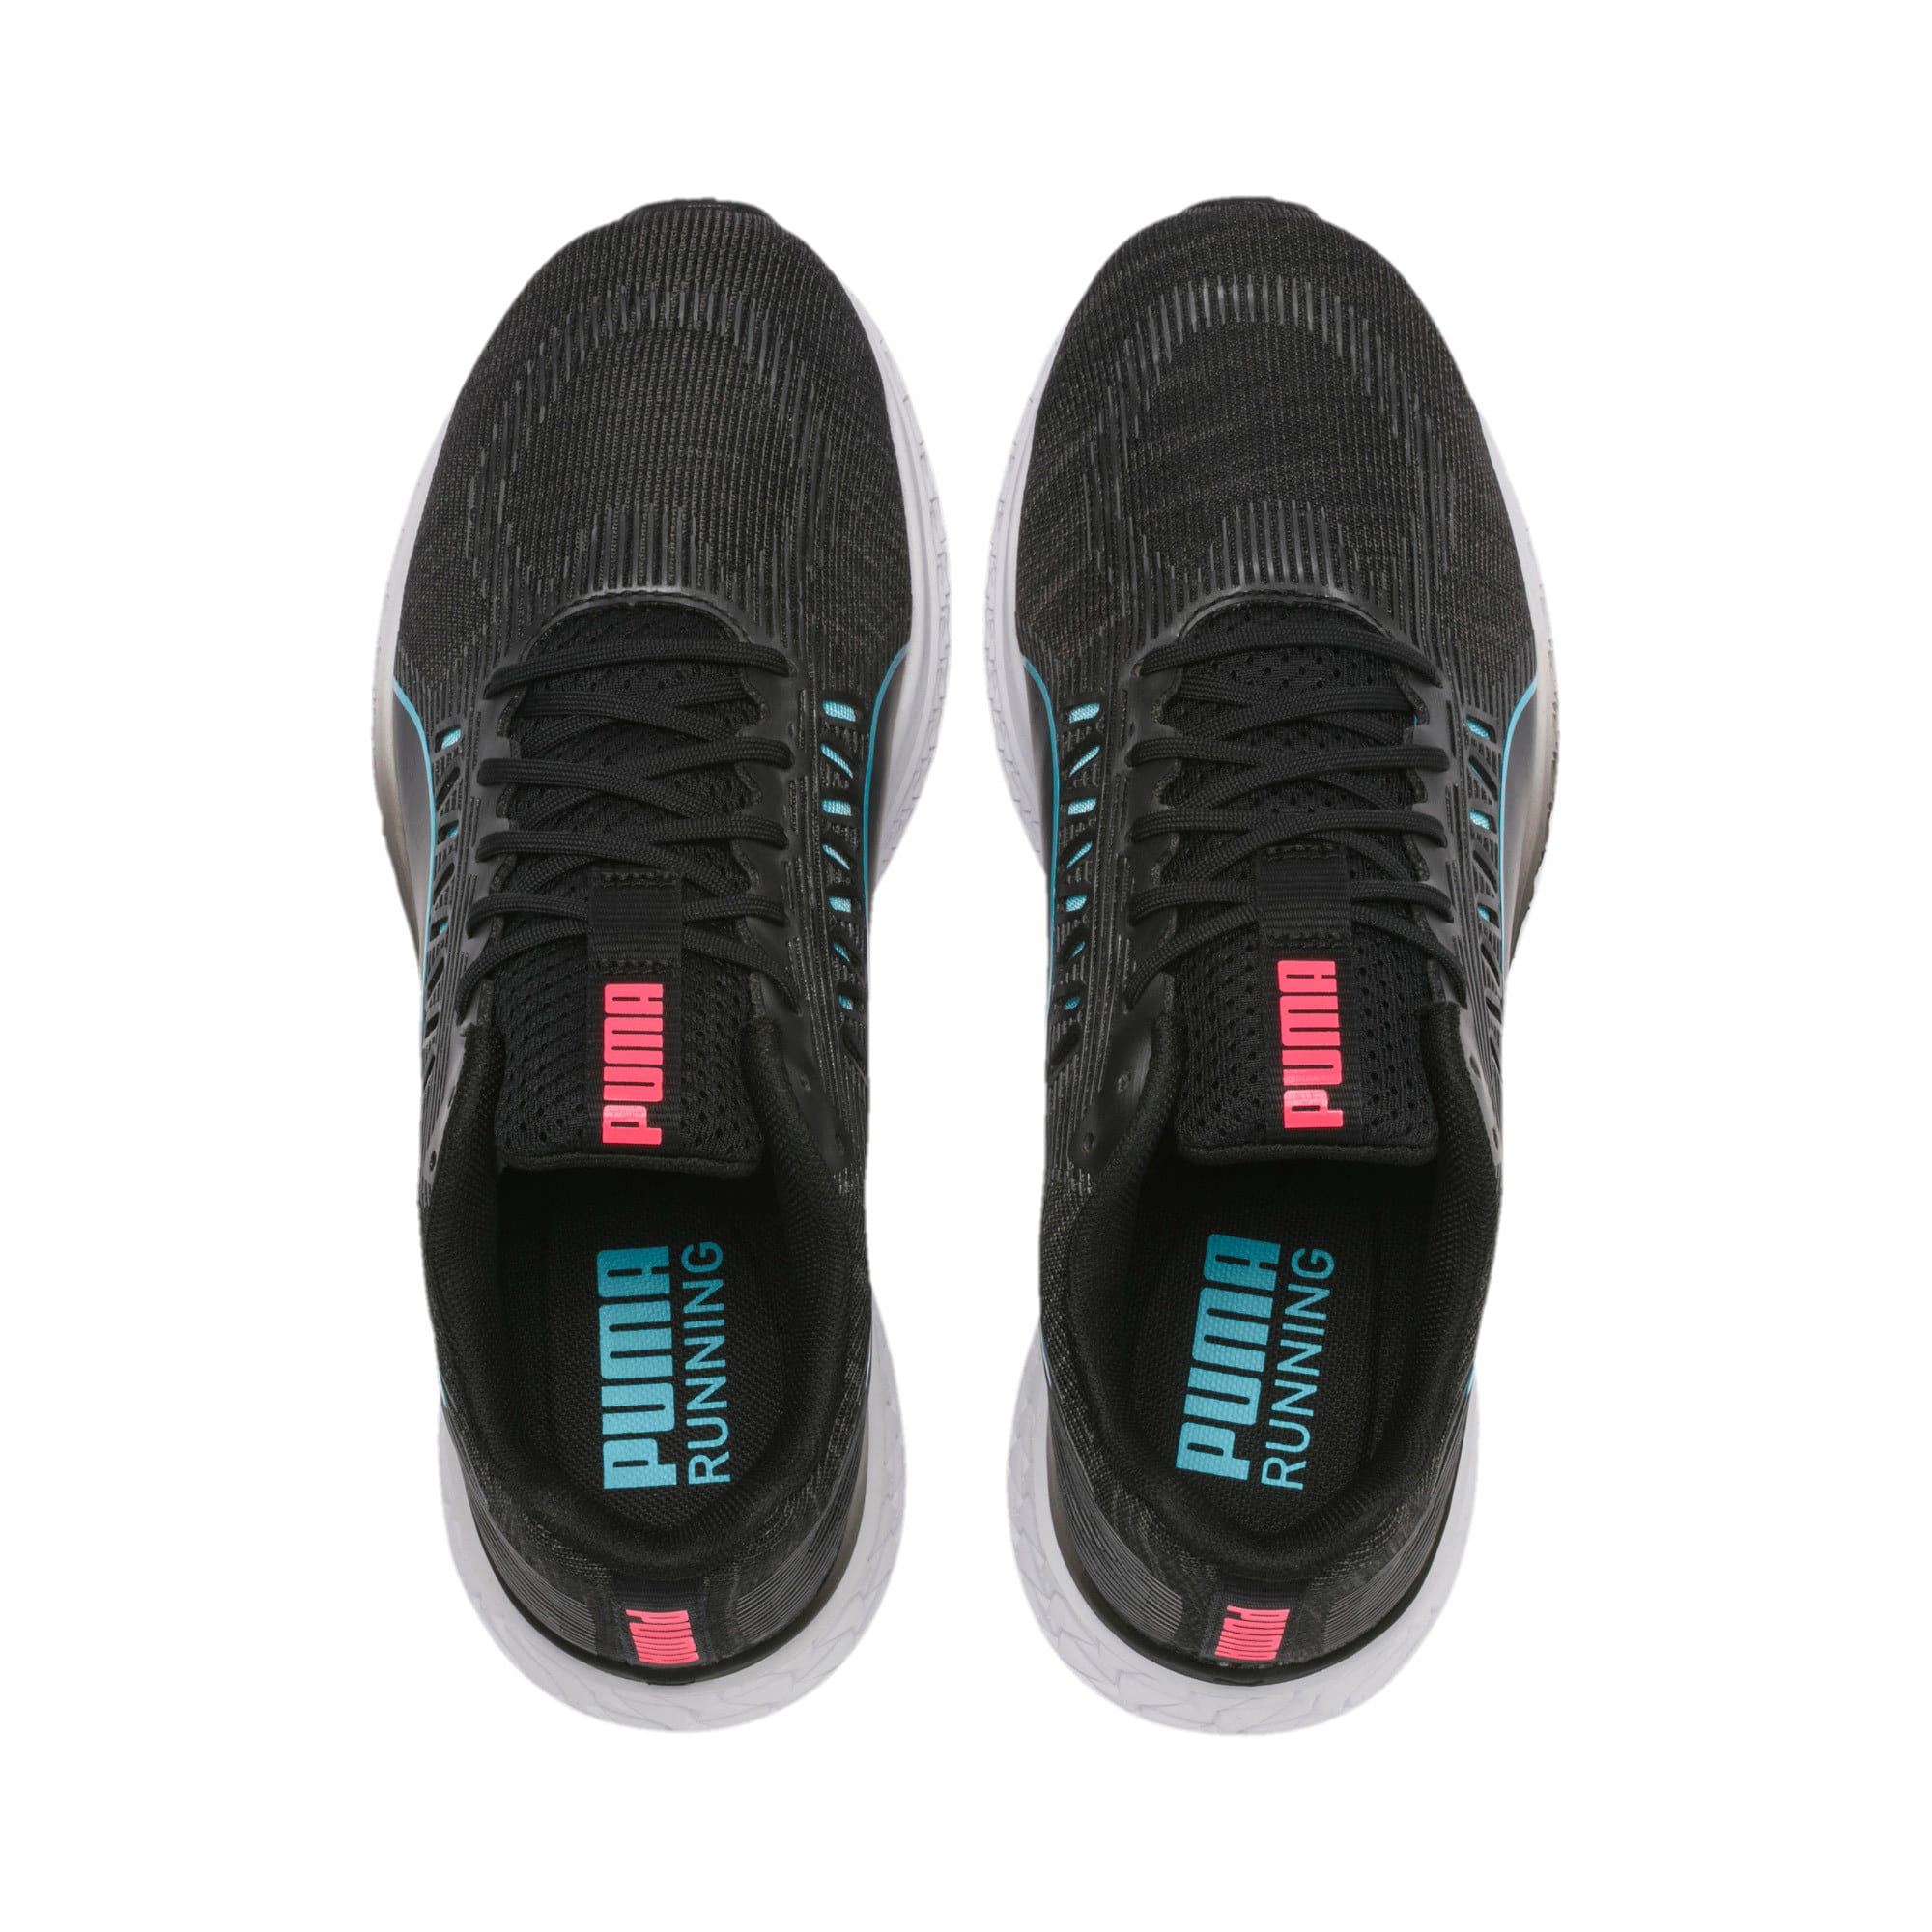 Thumbnail 7 of Speed Sutamina Women's Running Shoes, Black-Milky Blue-Pink Alert, medium